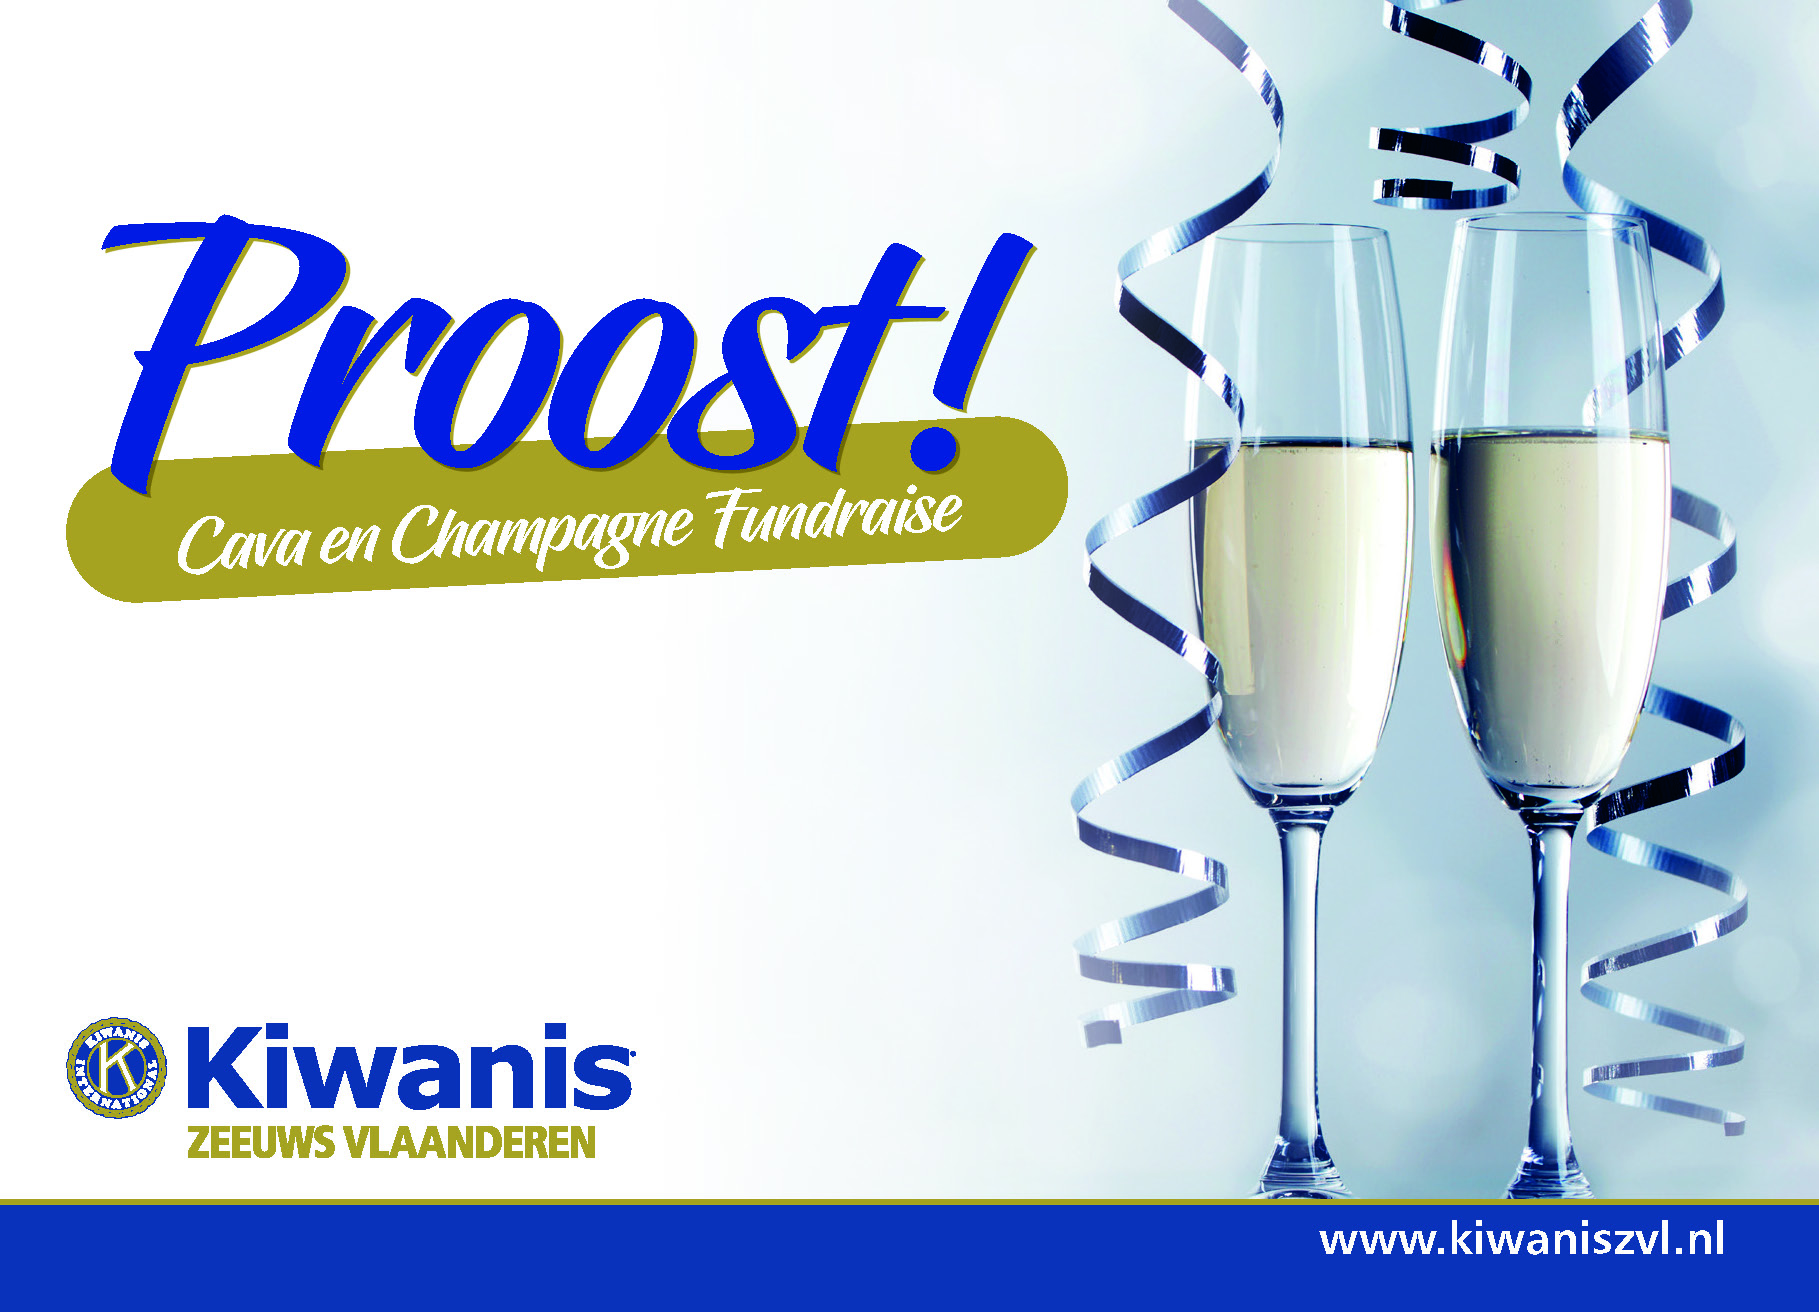 Champagne en Cava Fundraise 2020/2021